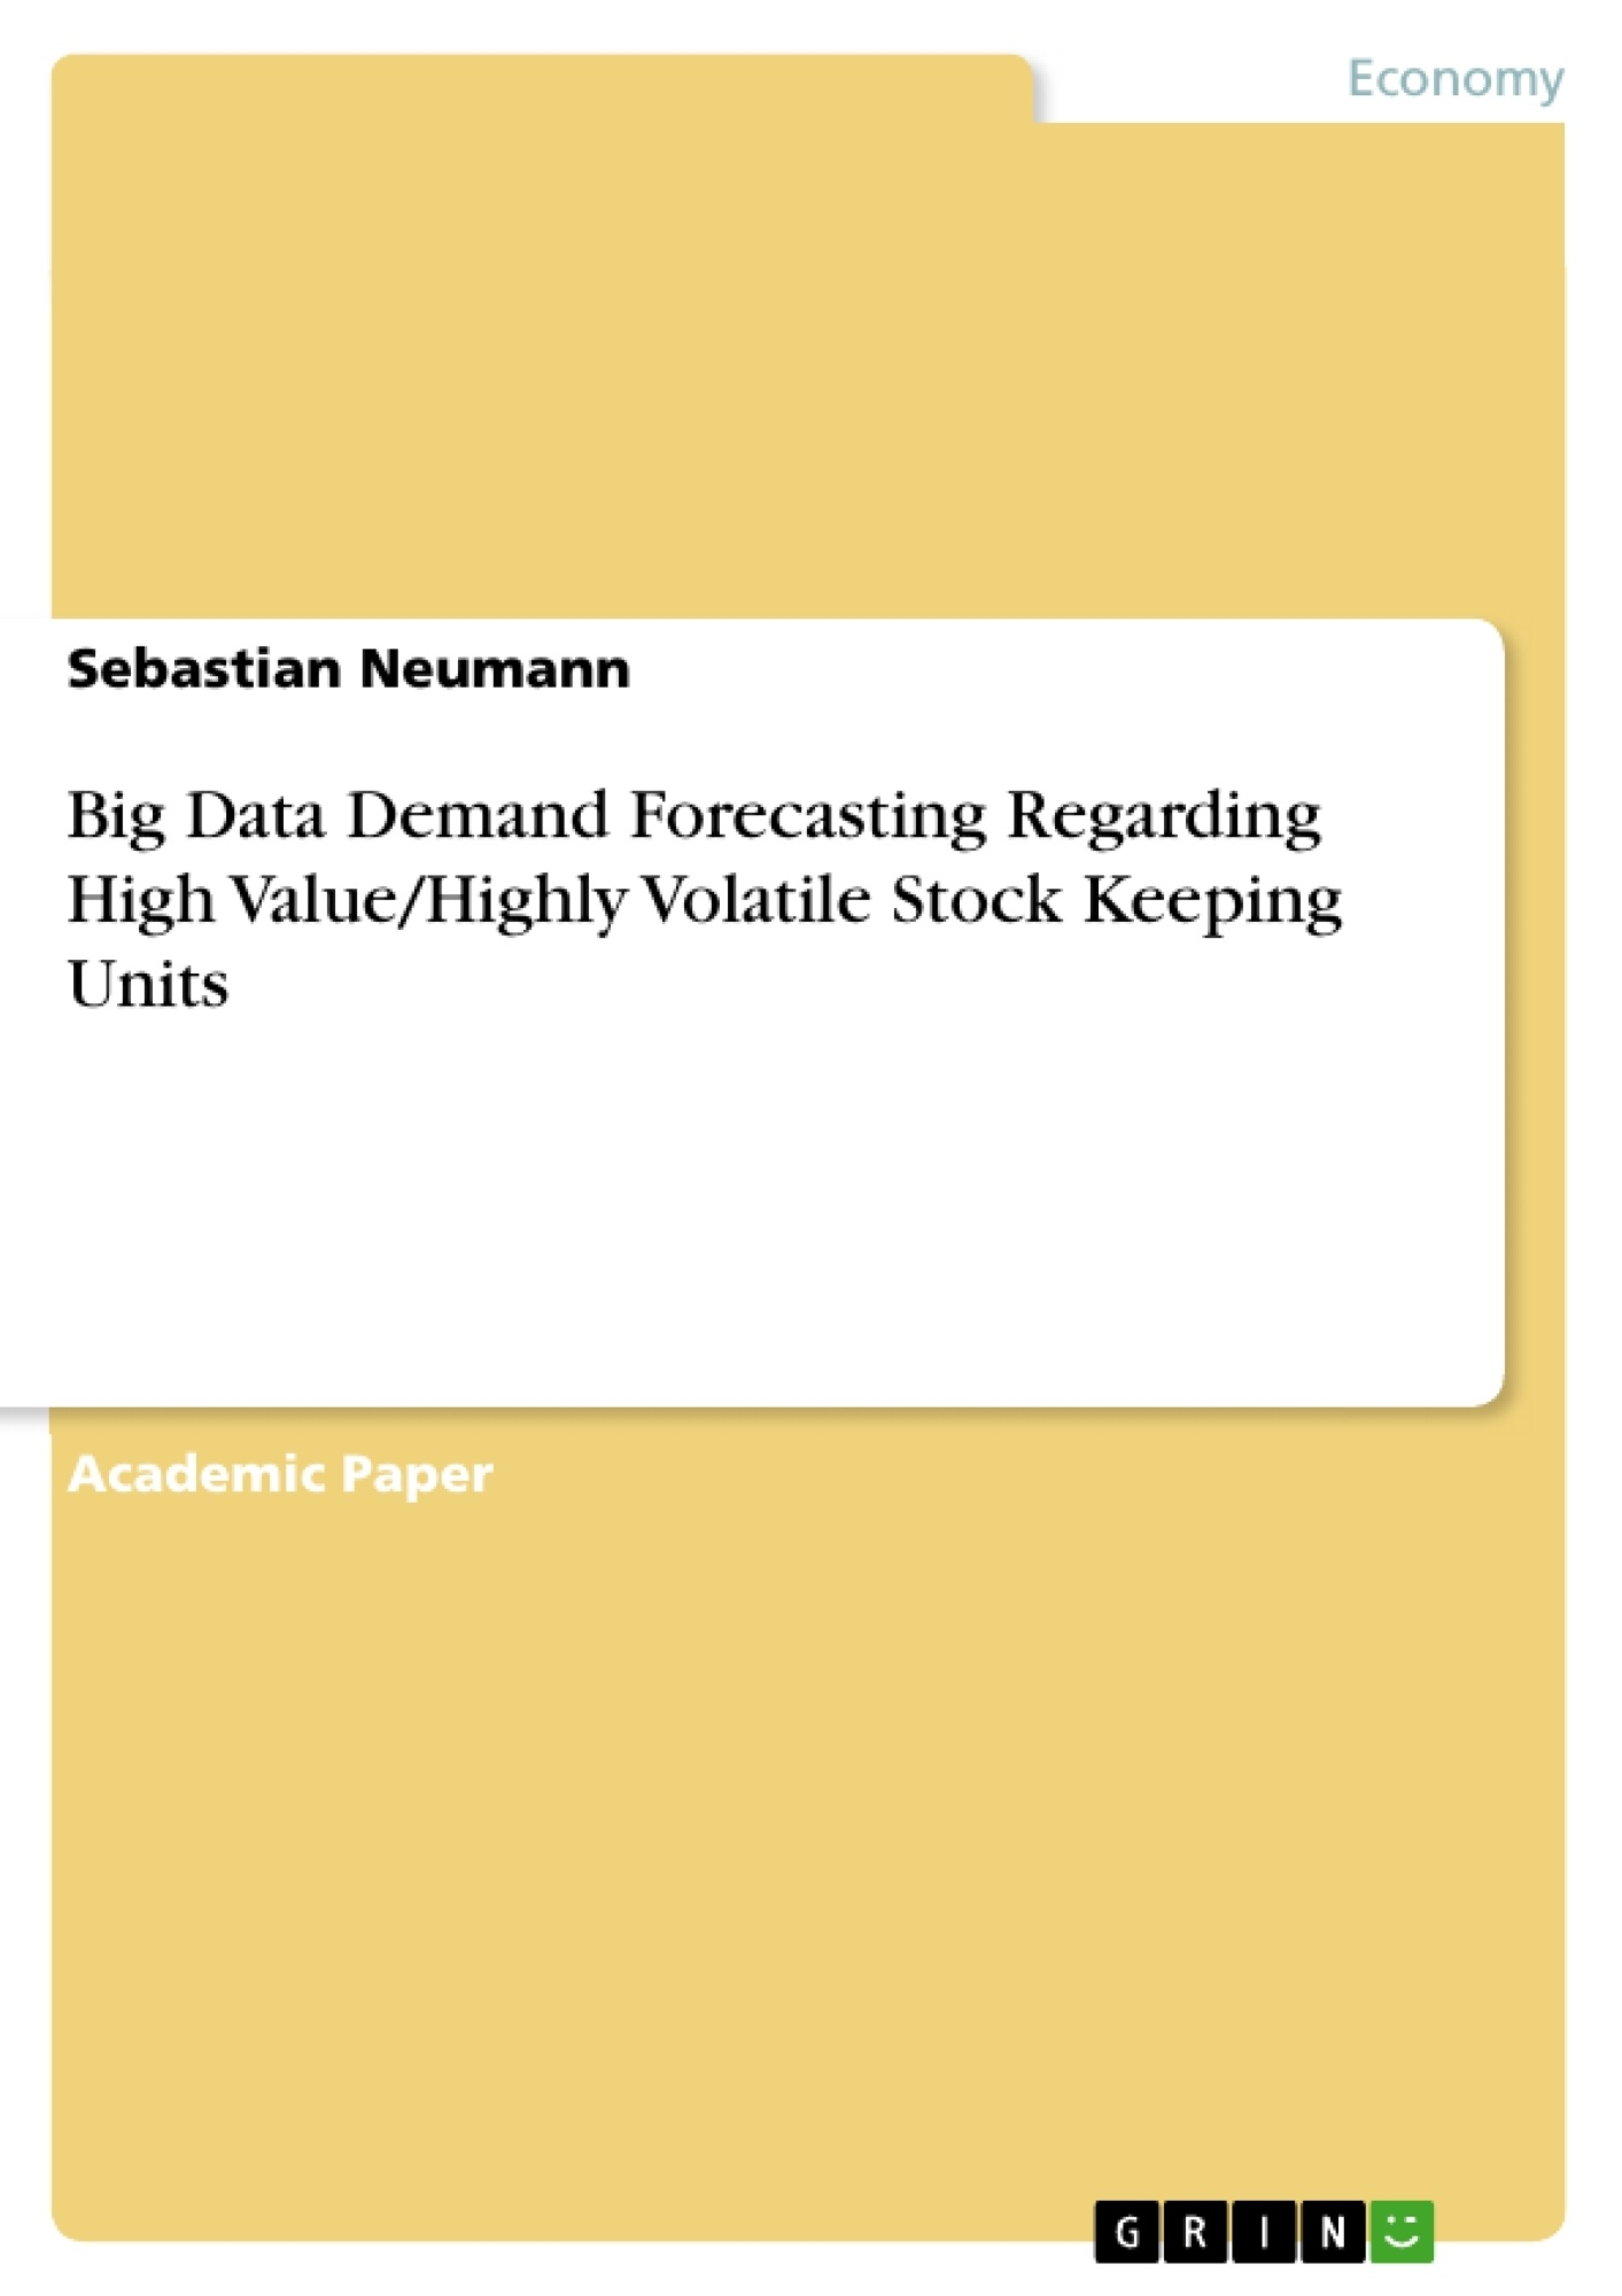 Title: Big Data Demand Forecasting Regarding High Value/Highly Volatile Stock Keeping Units